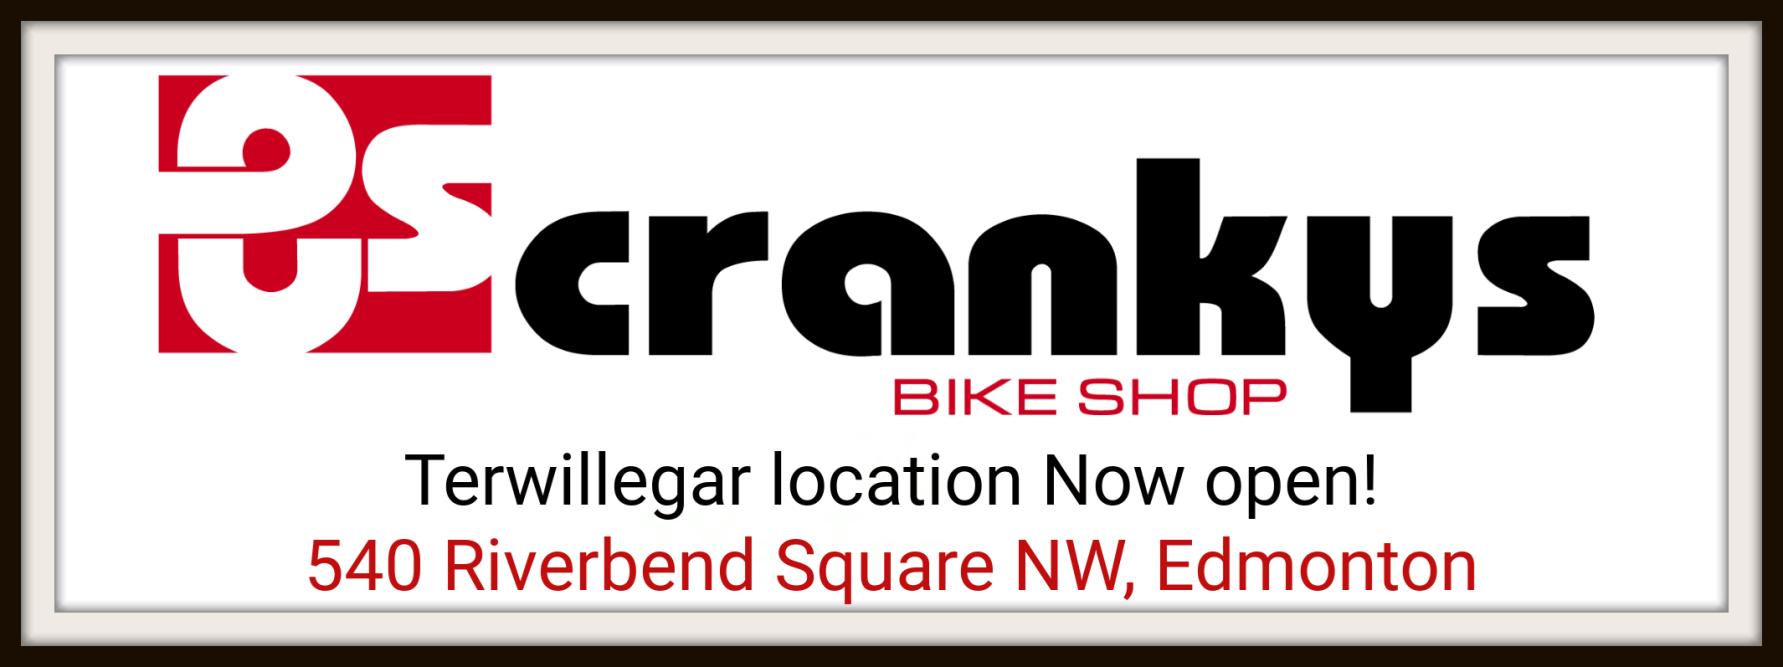 Bike stores south edmonton